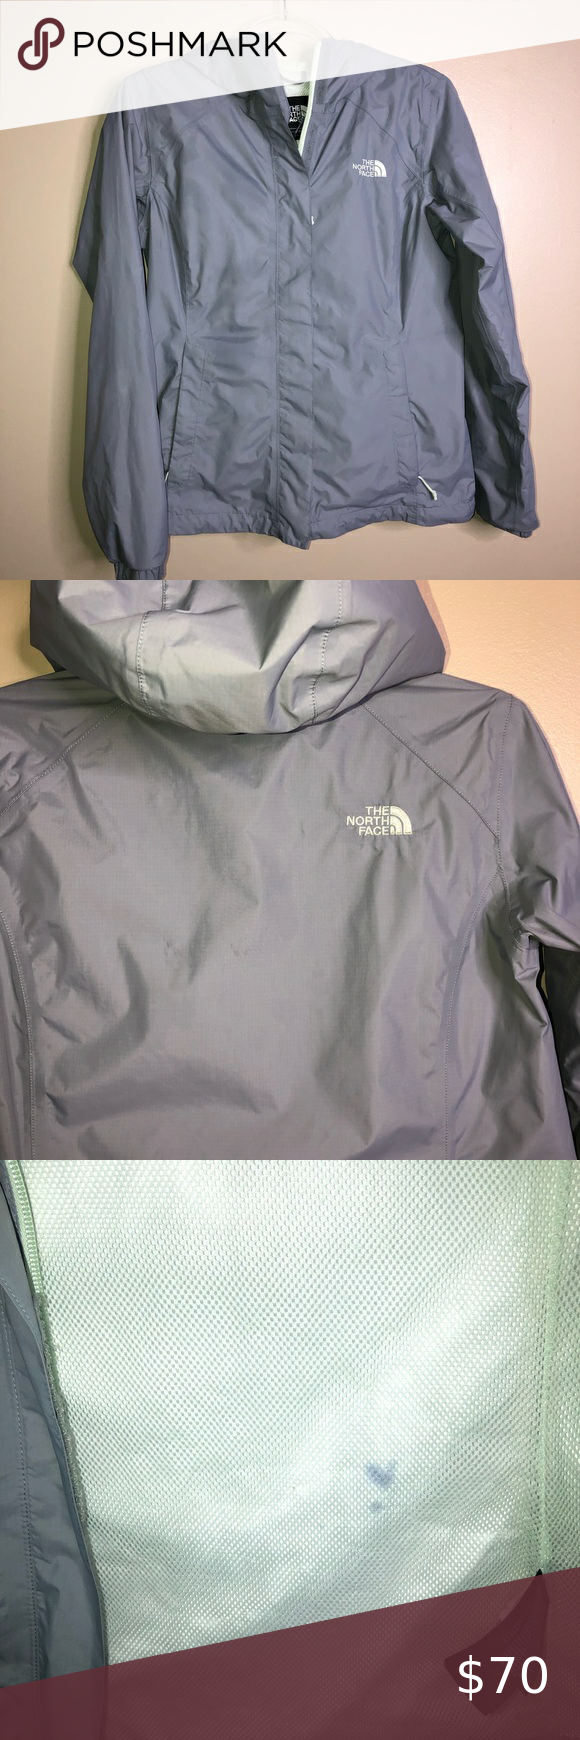 Grey The North Face Rain Jacket North Face Rain Jacket Rain Jacket The North Face [ 1740 x 580 Pixel ]